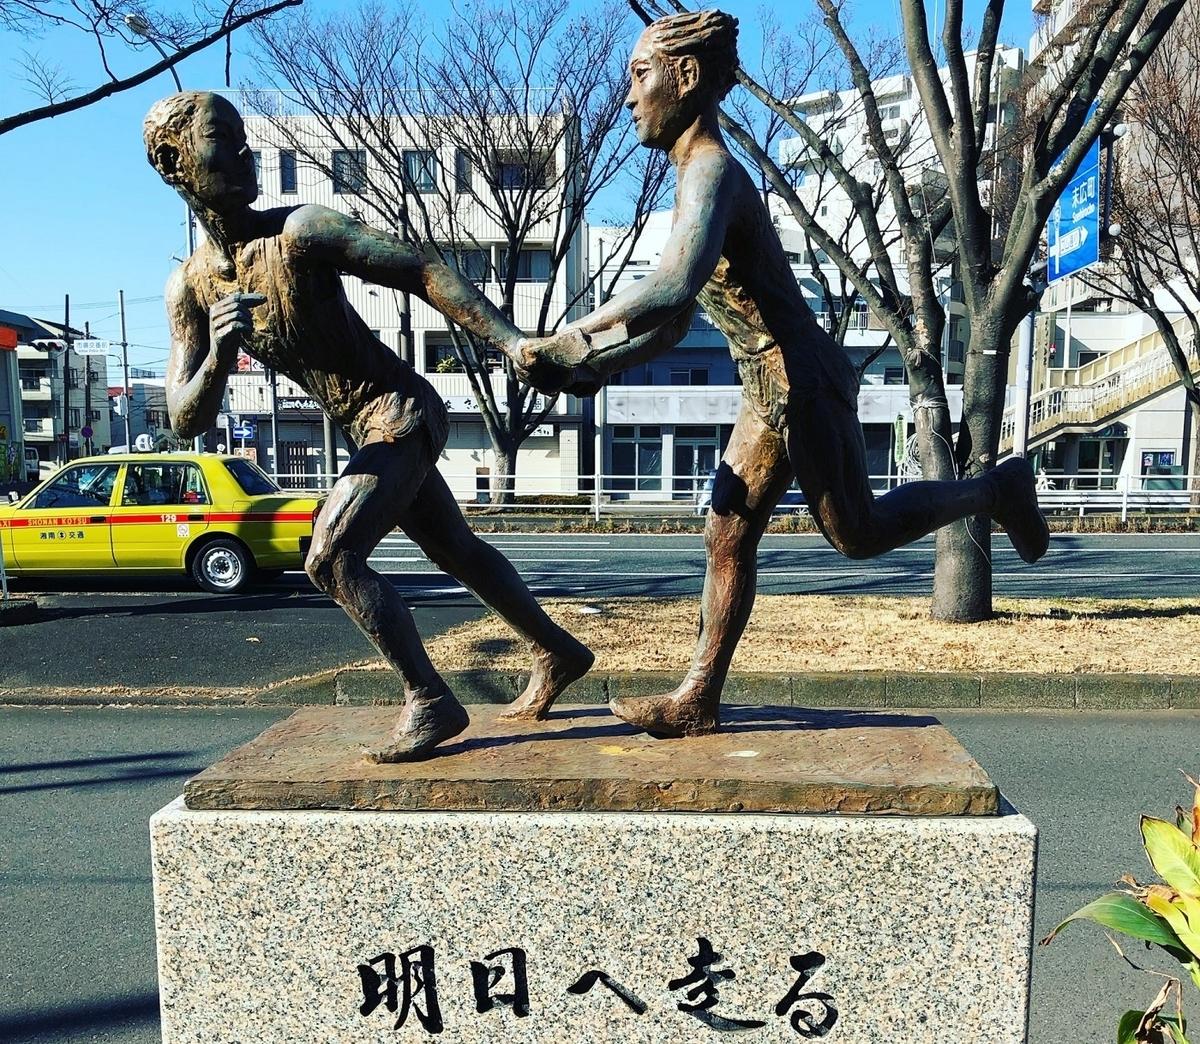 箱根駅伝 鶴見中継所 2区 9区 花の2区